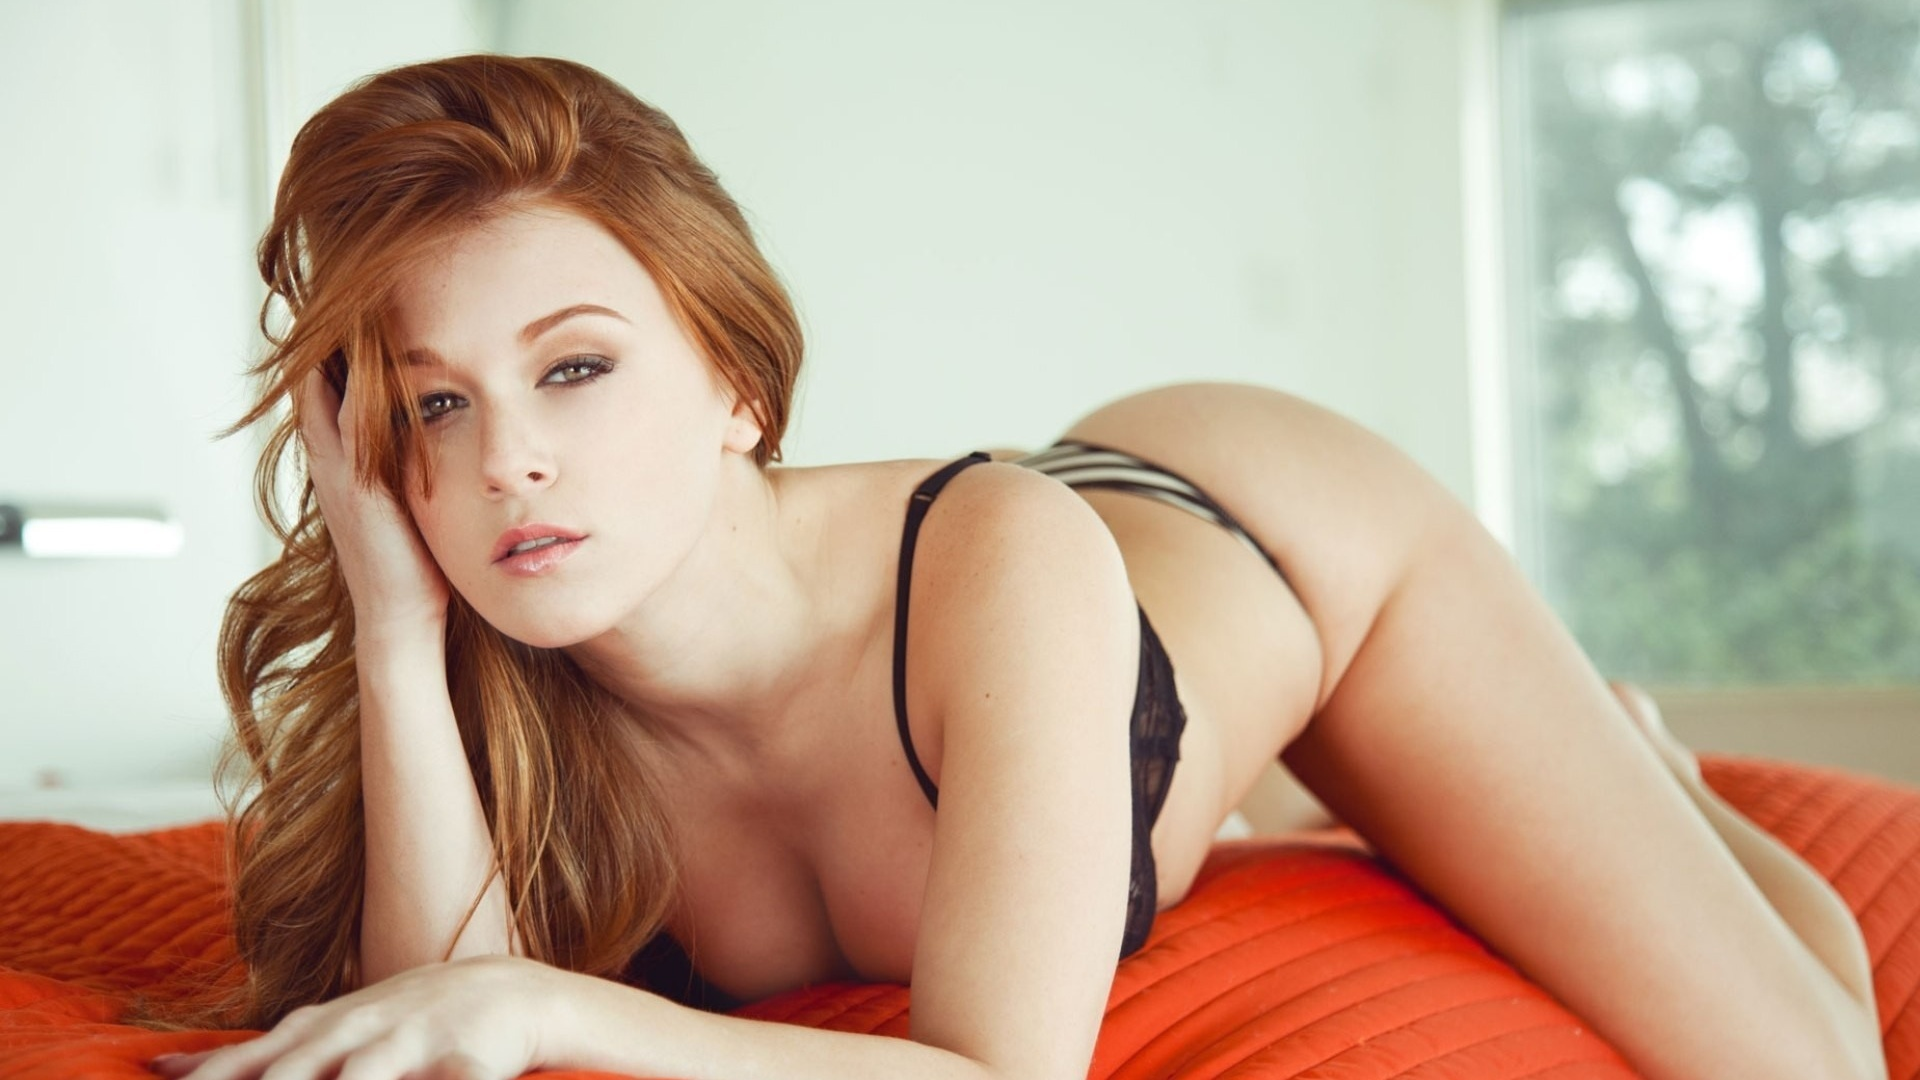 Sexandsexynight nude movie